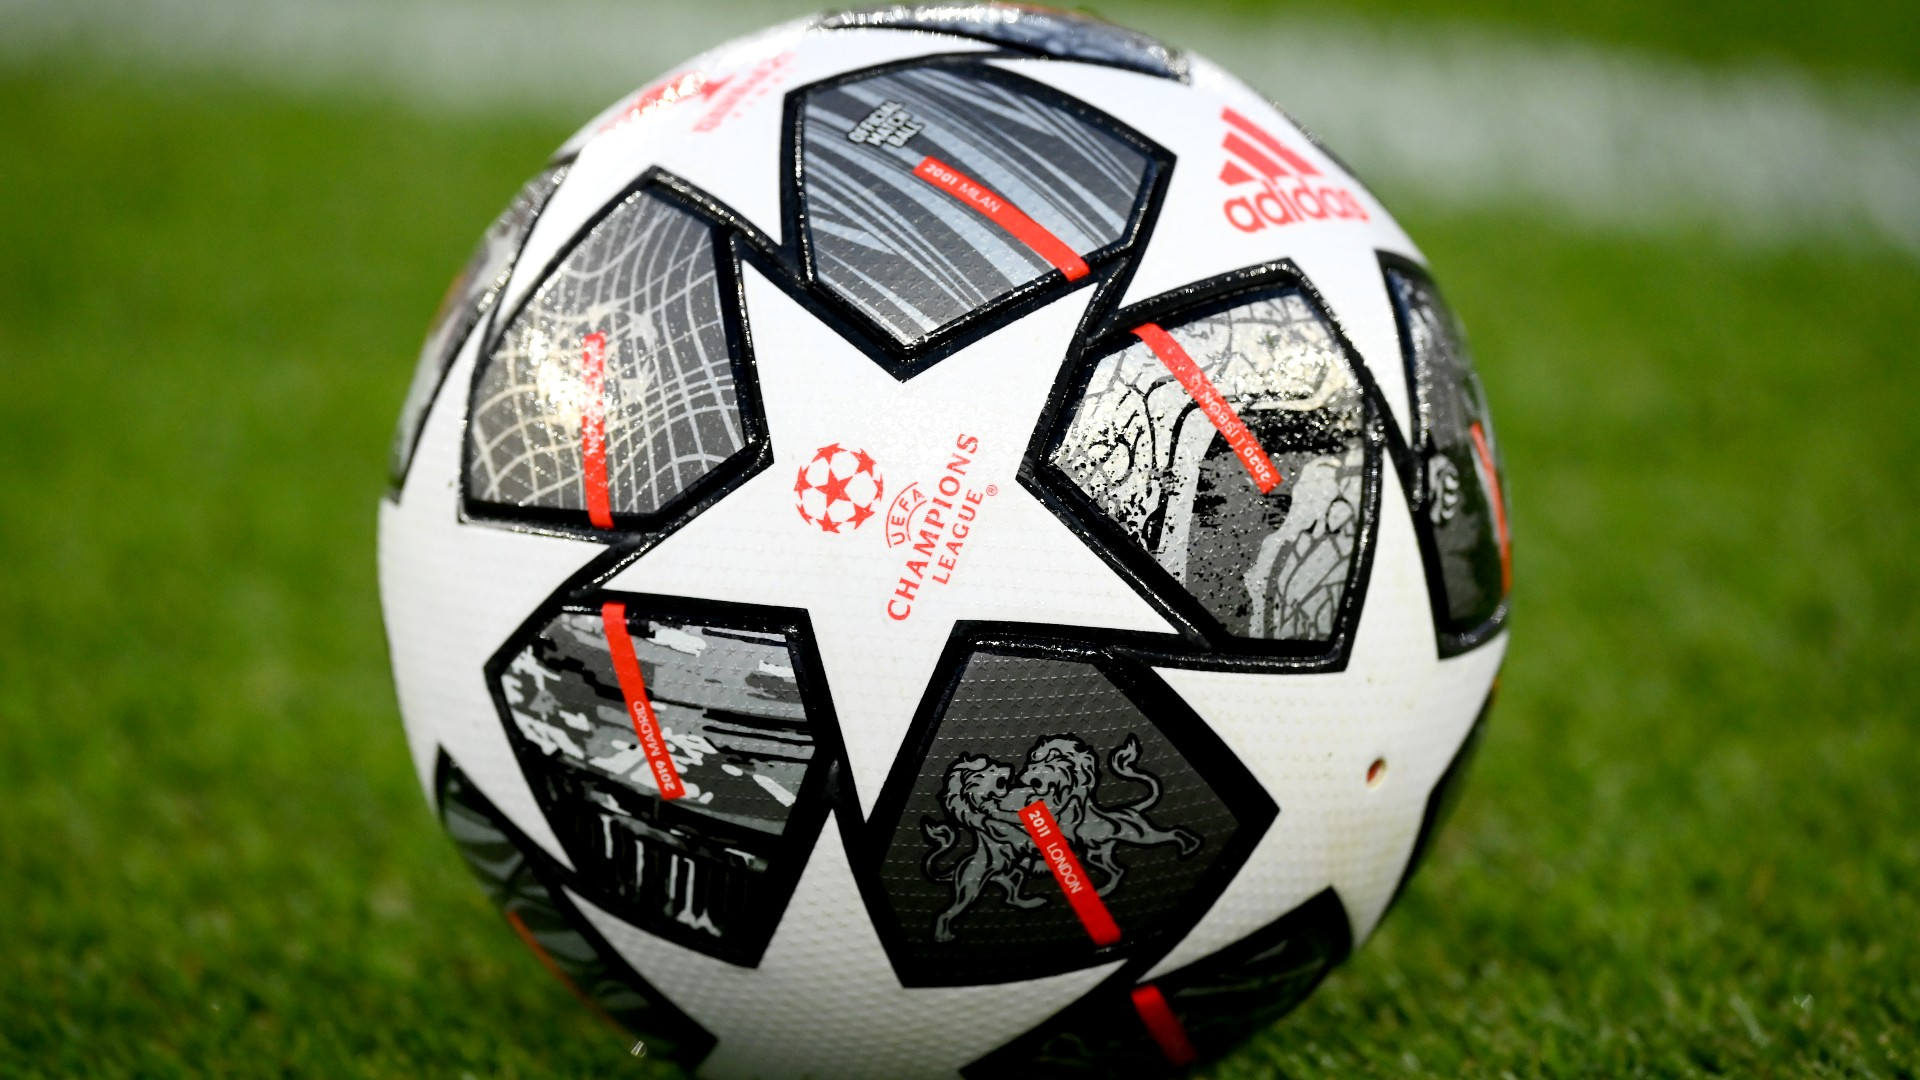 uefa champions league ball 2021 1rkkgyanlq6lw1w477jzn2uk6n